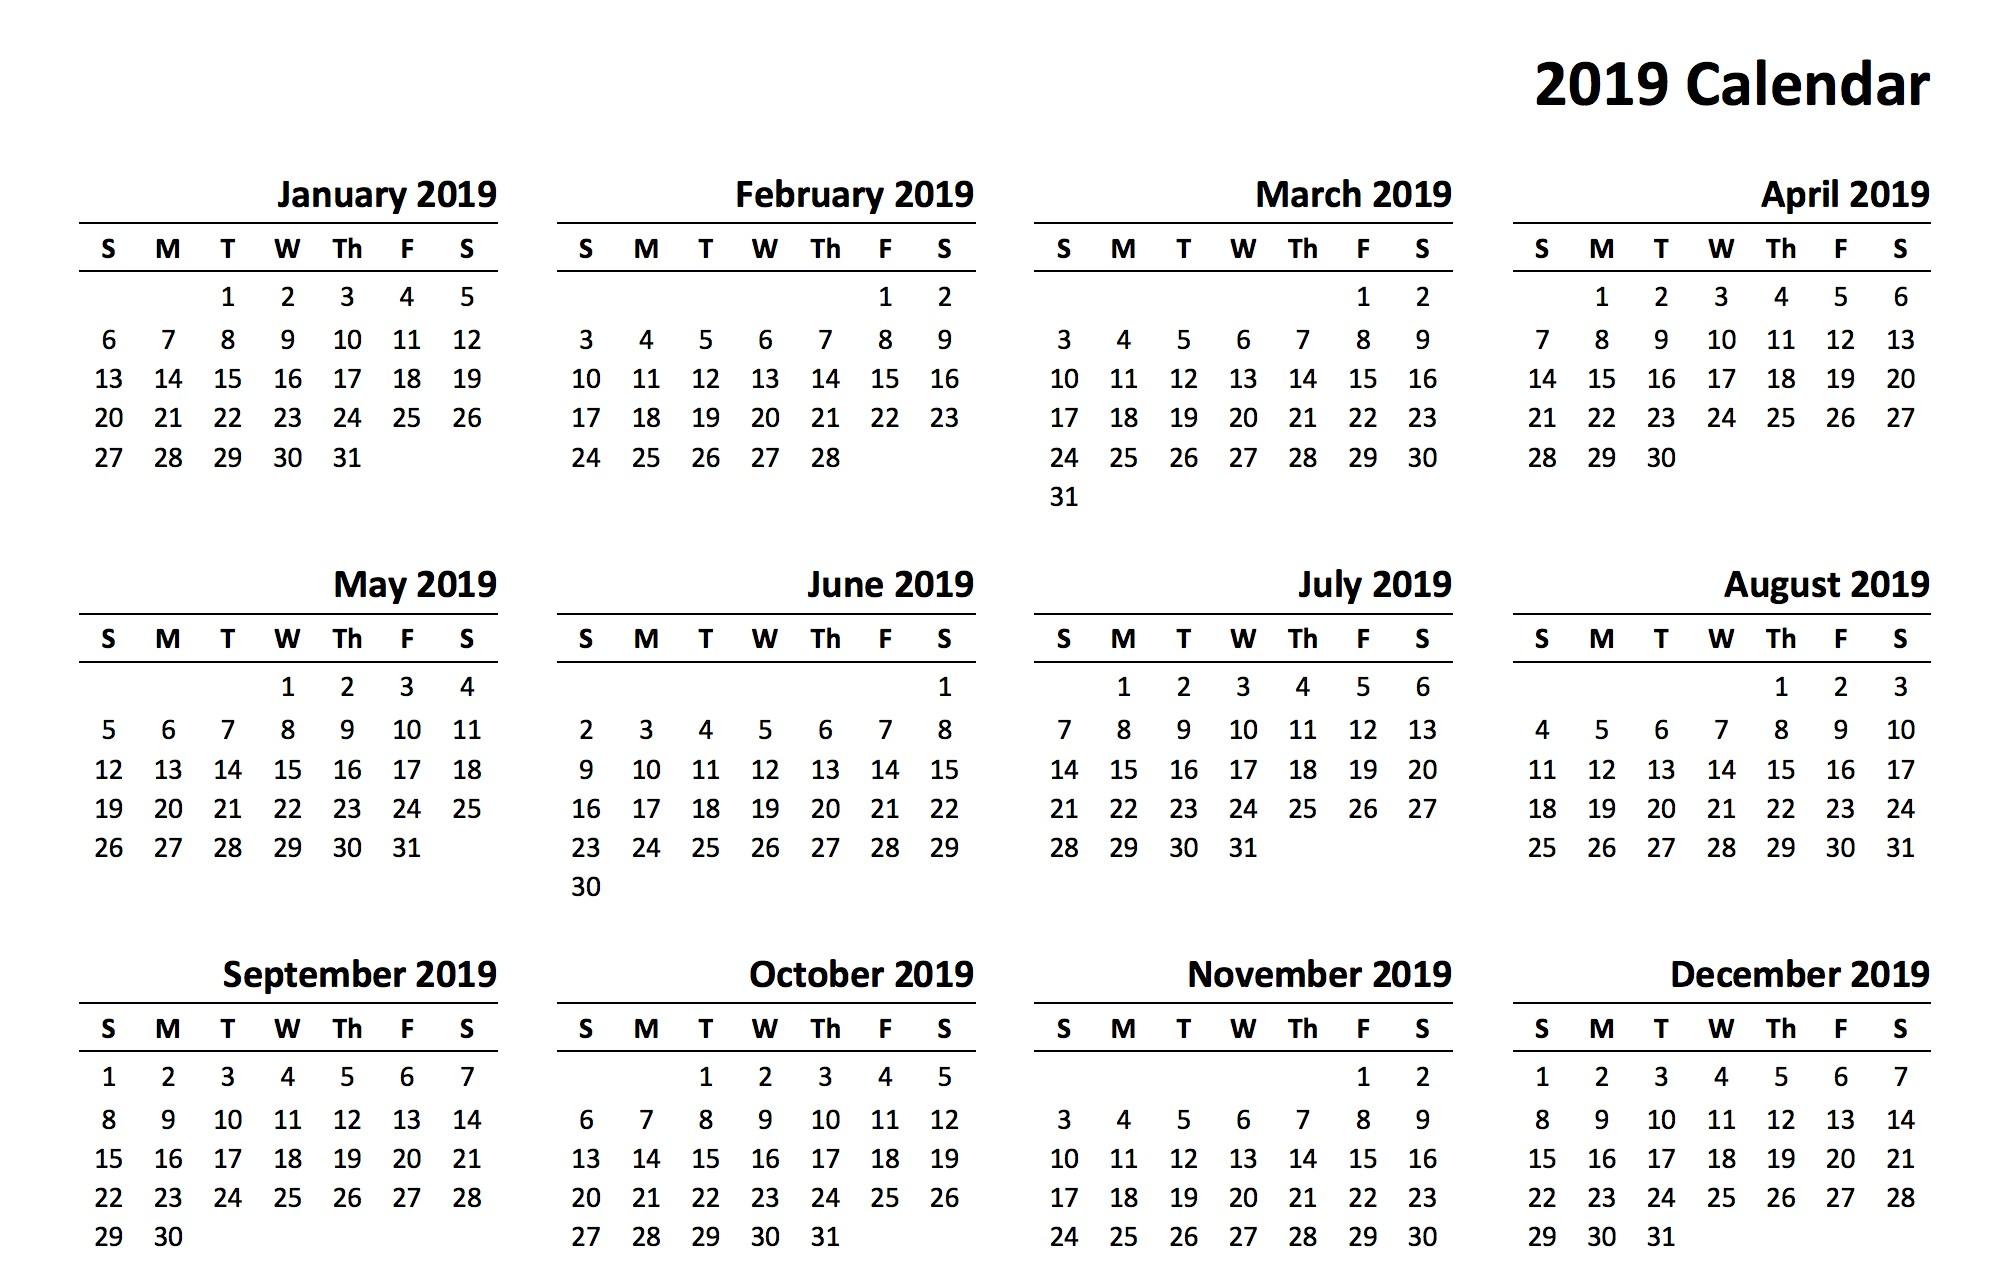 Printable Yearly Calendars 2019 2019 Calendar Amazonaws